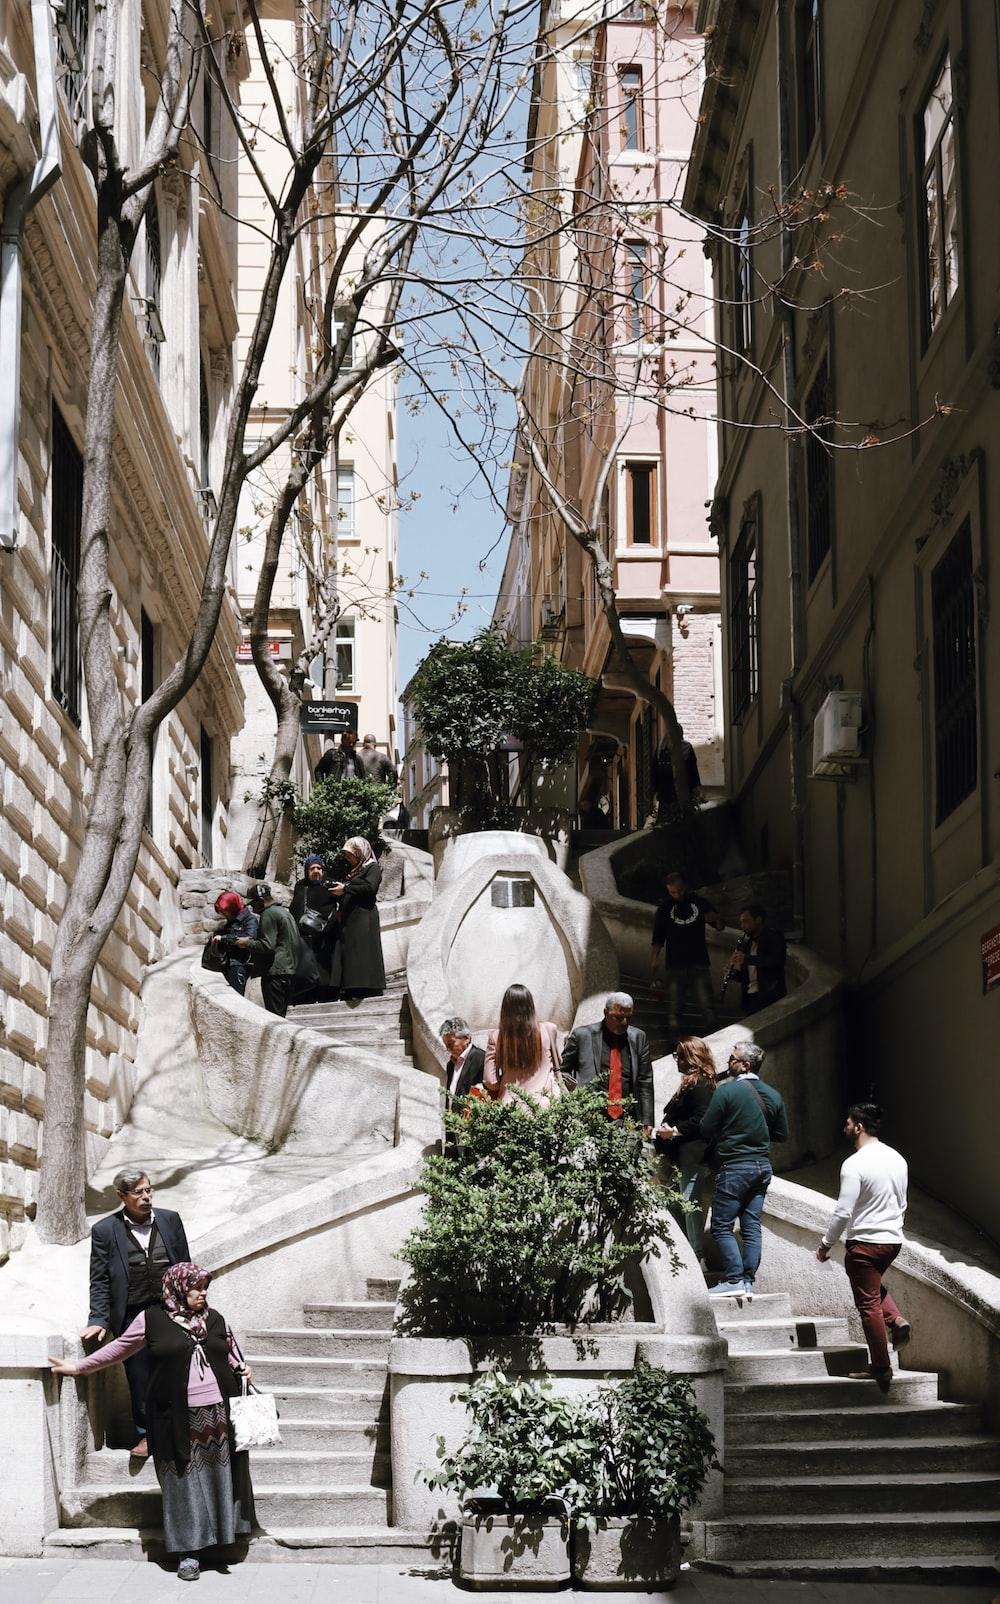 people walking on stairway during daytime